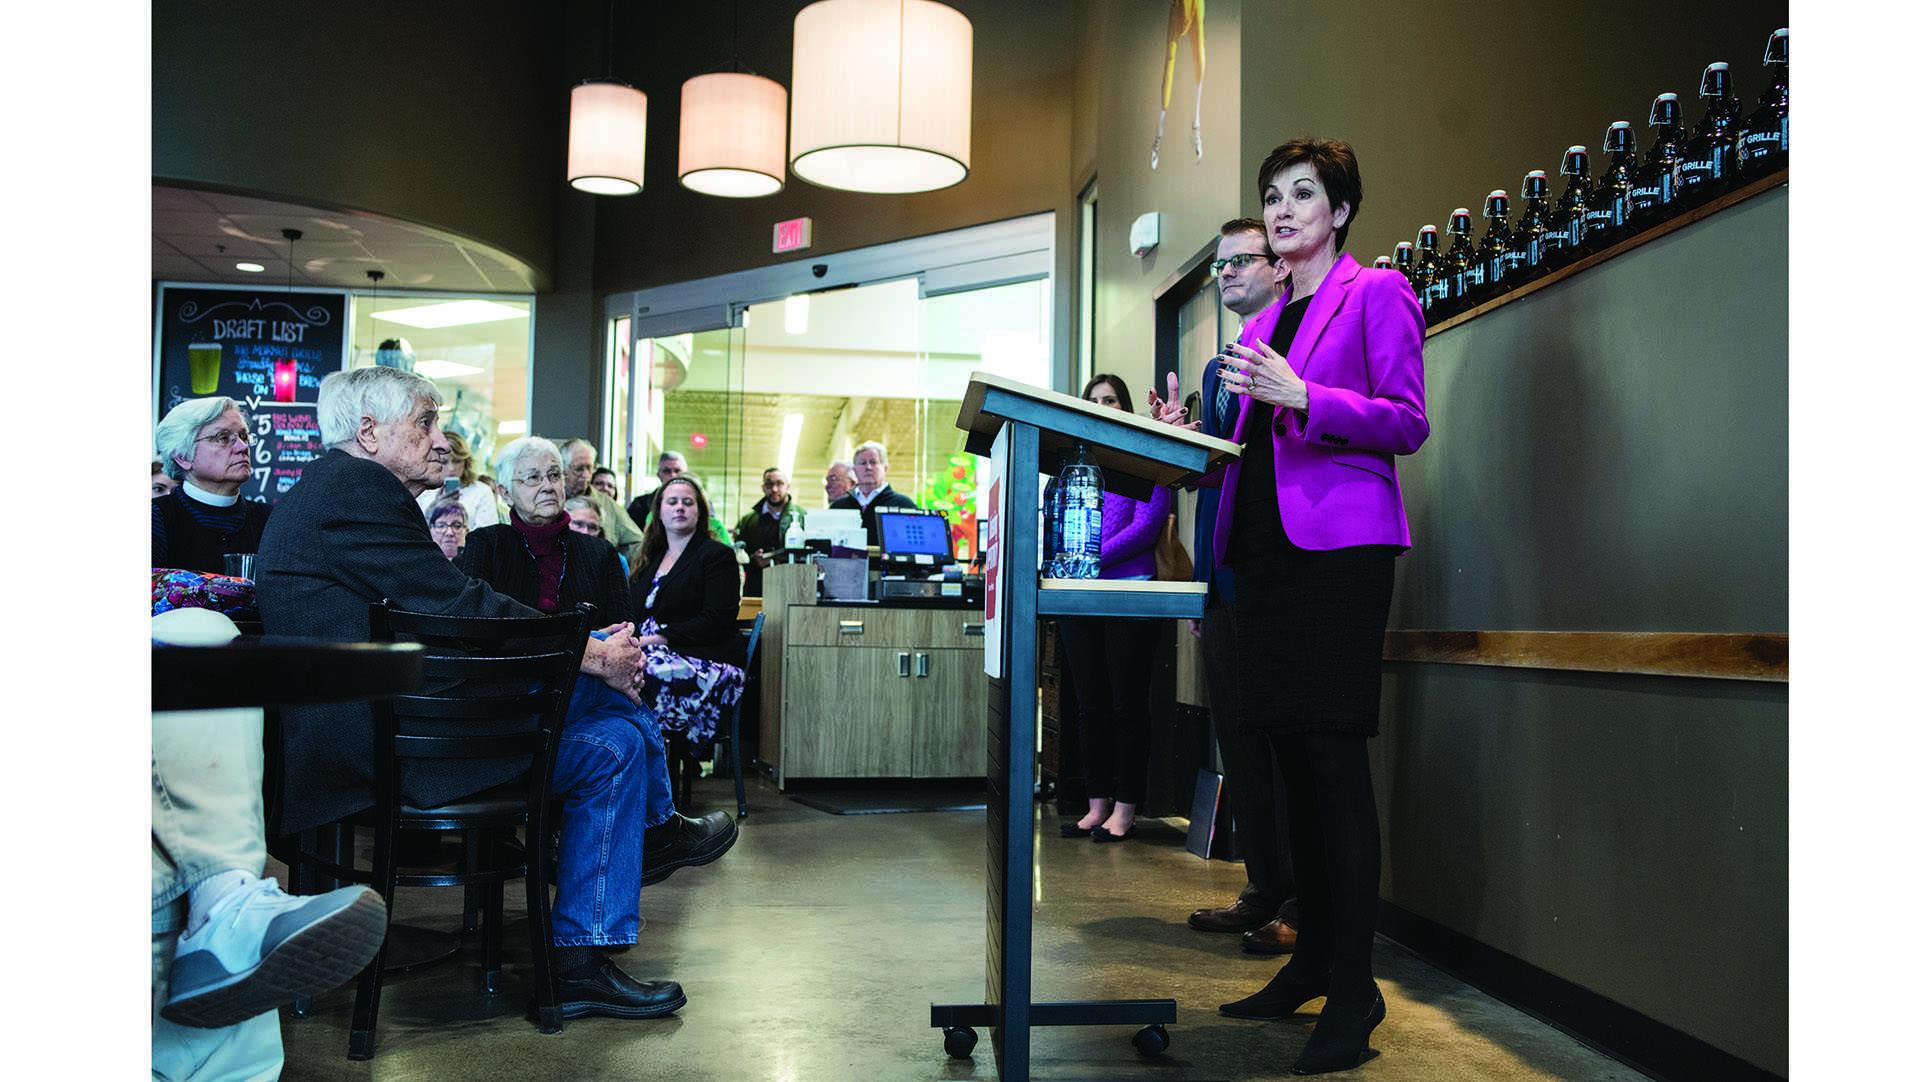 Reynolds tallies legislative wins in Hawkeye territory